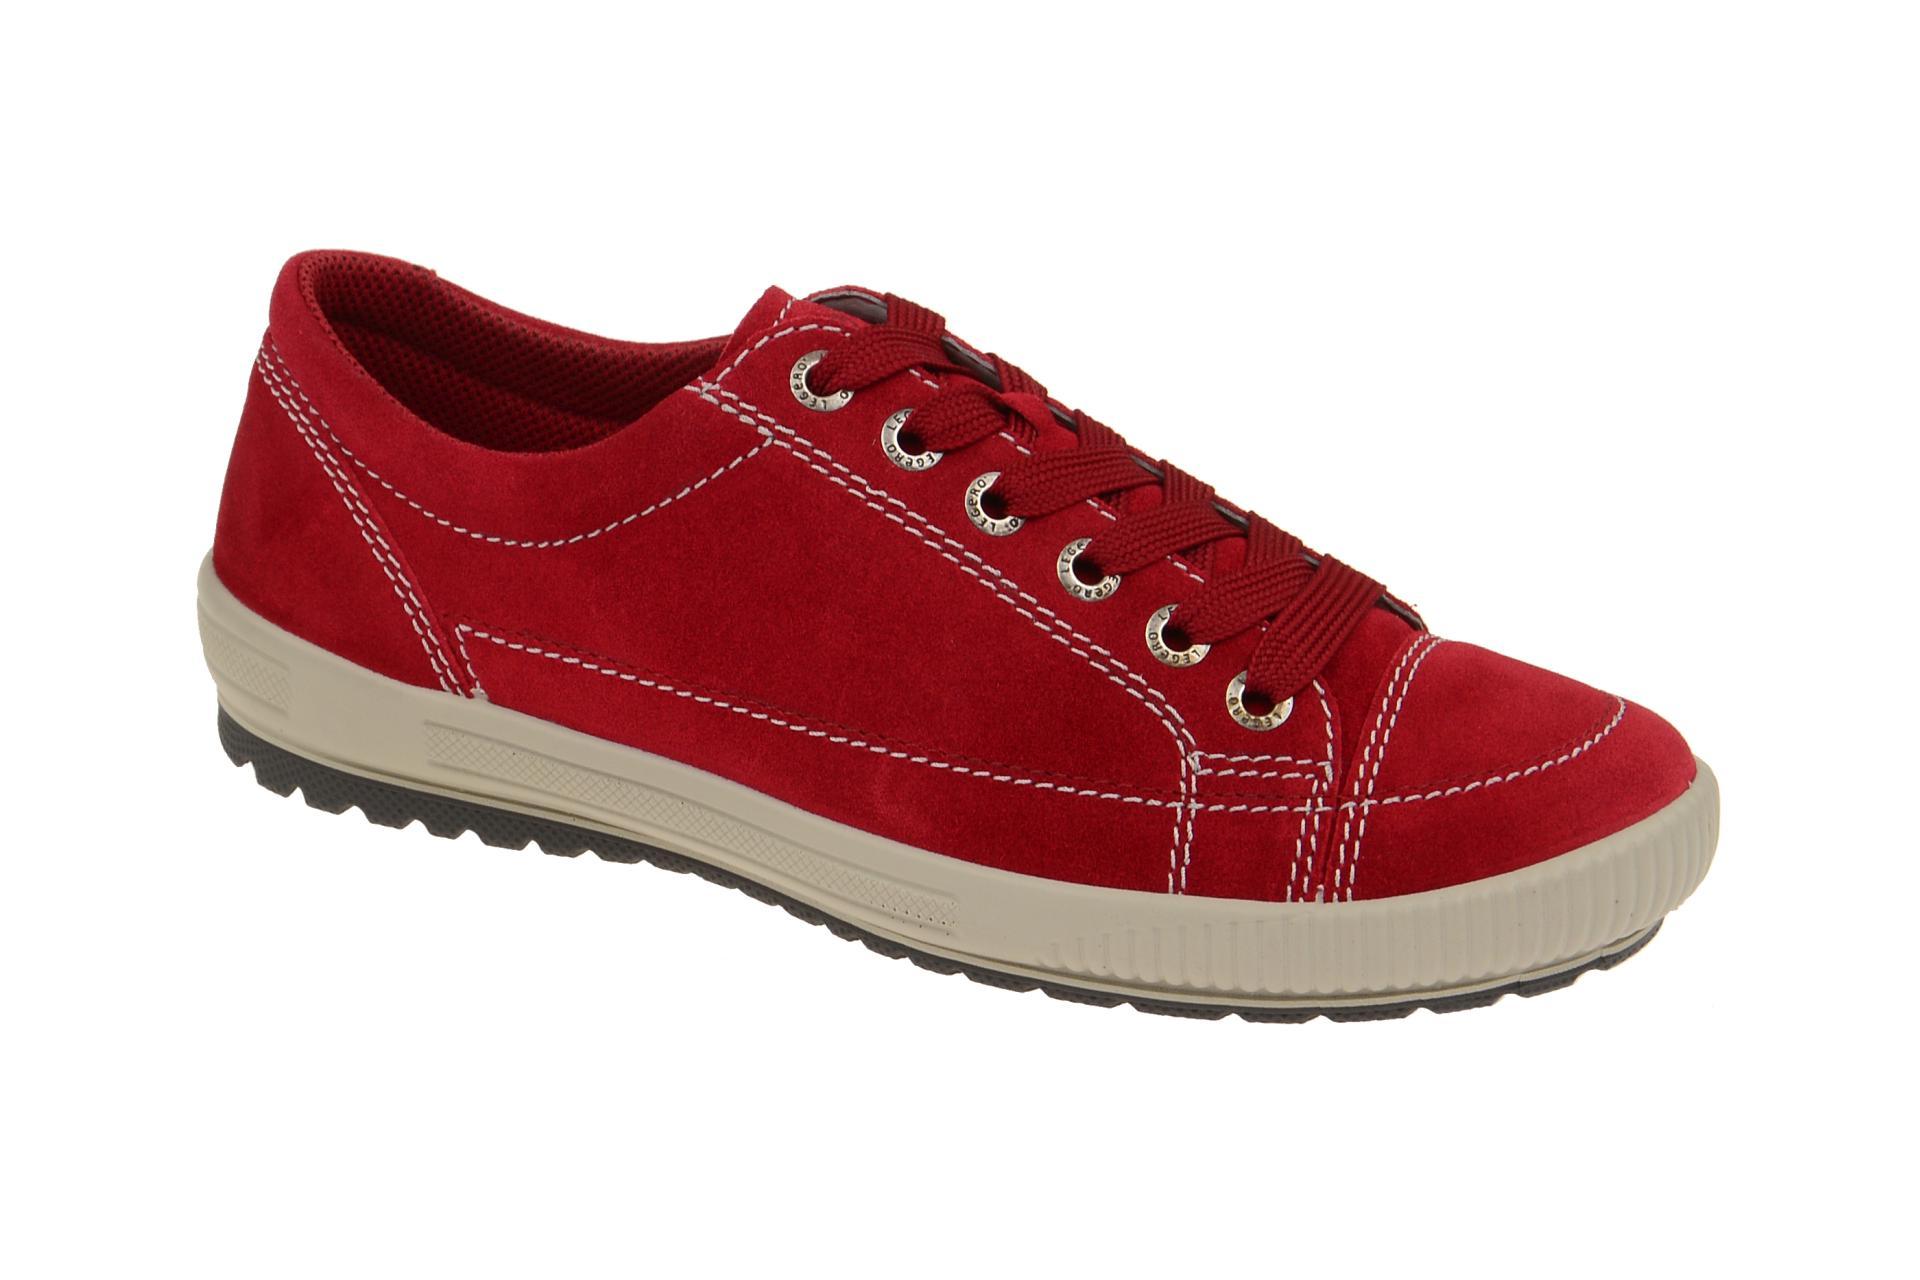 low priced 1ebcb 21a9d Legero Tanaro Schuhe rot - 0-00820-74